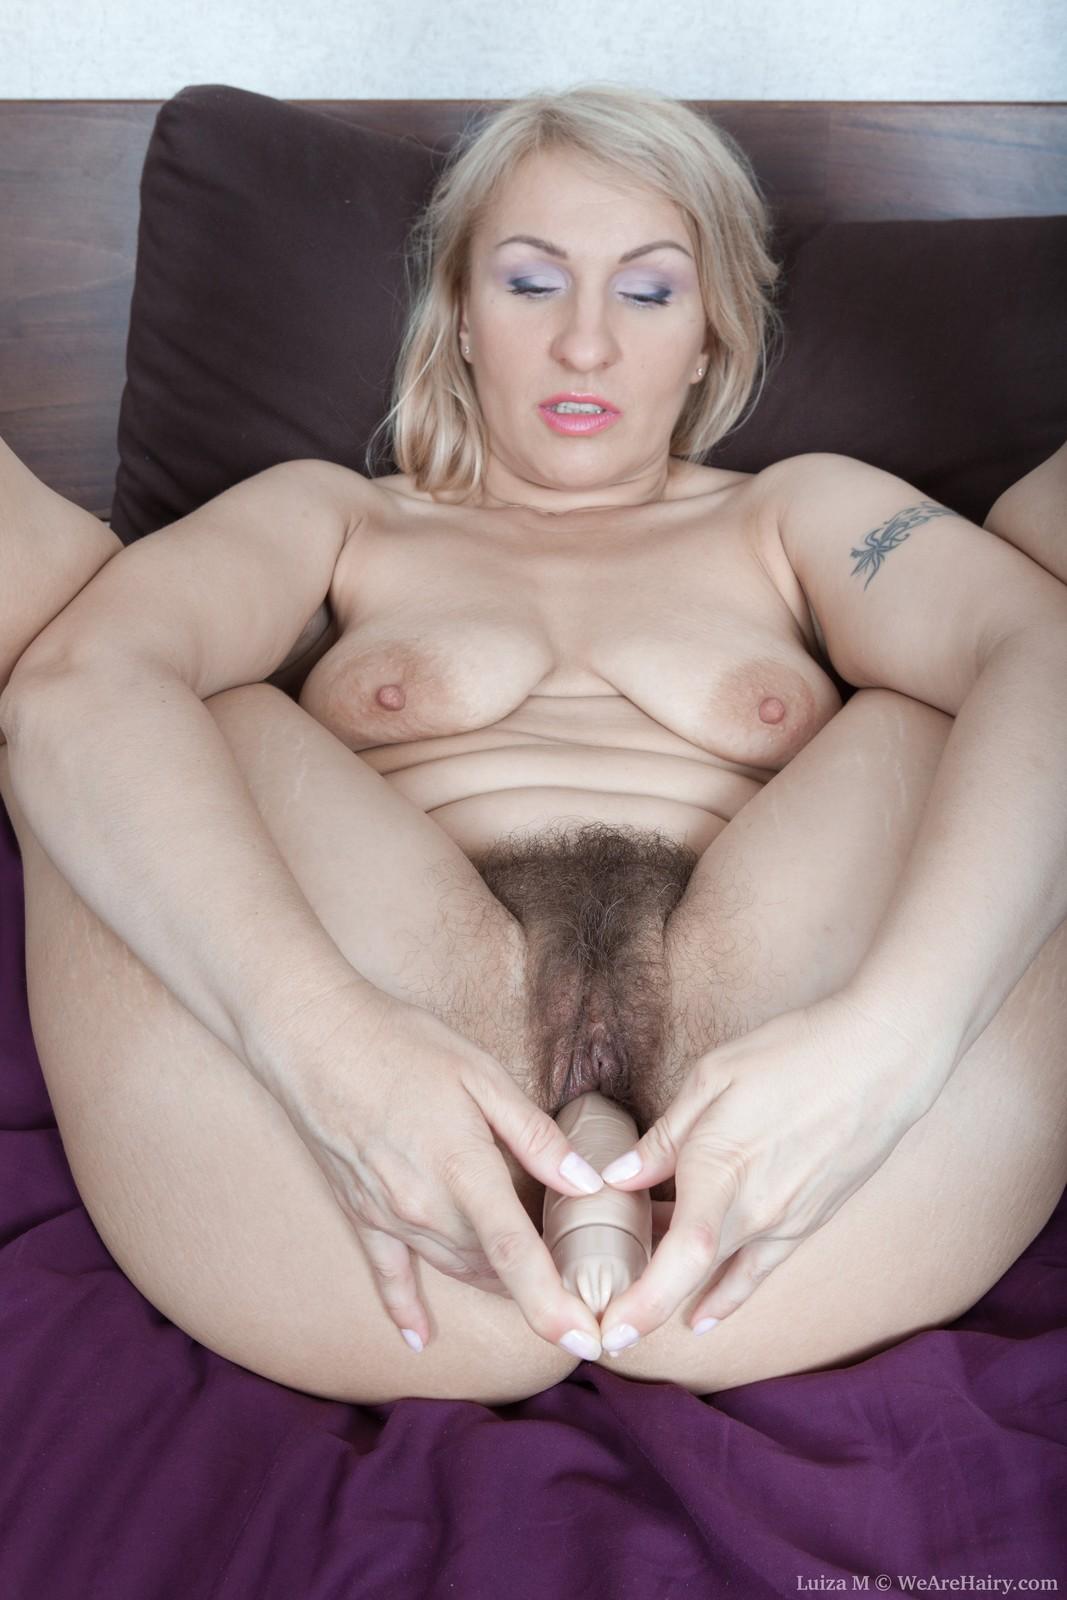 wpid-luiza-m-masturbates-with-her-vibrator14.jpg